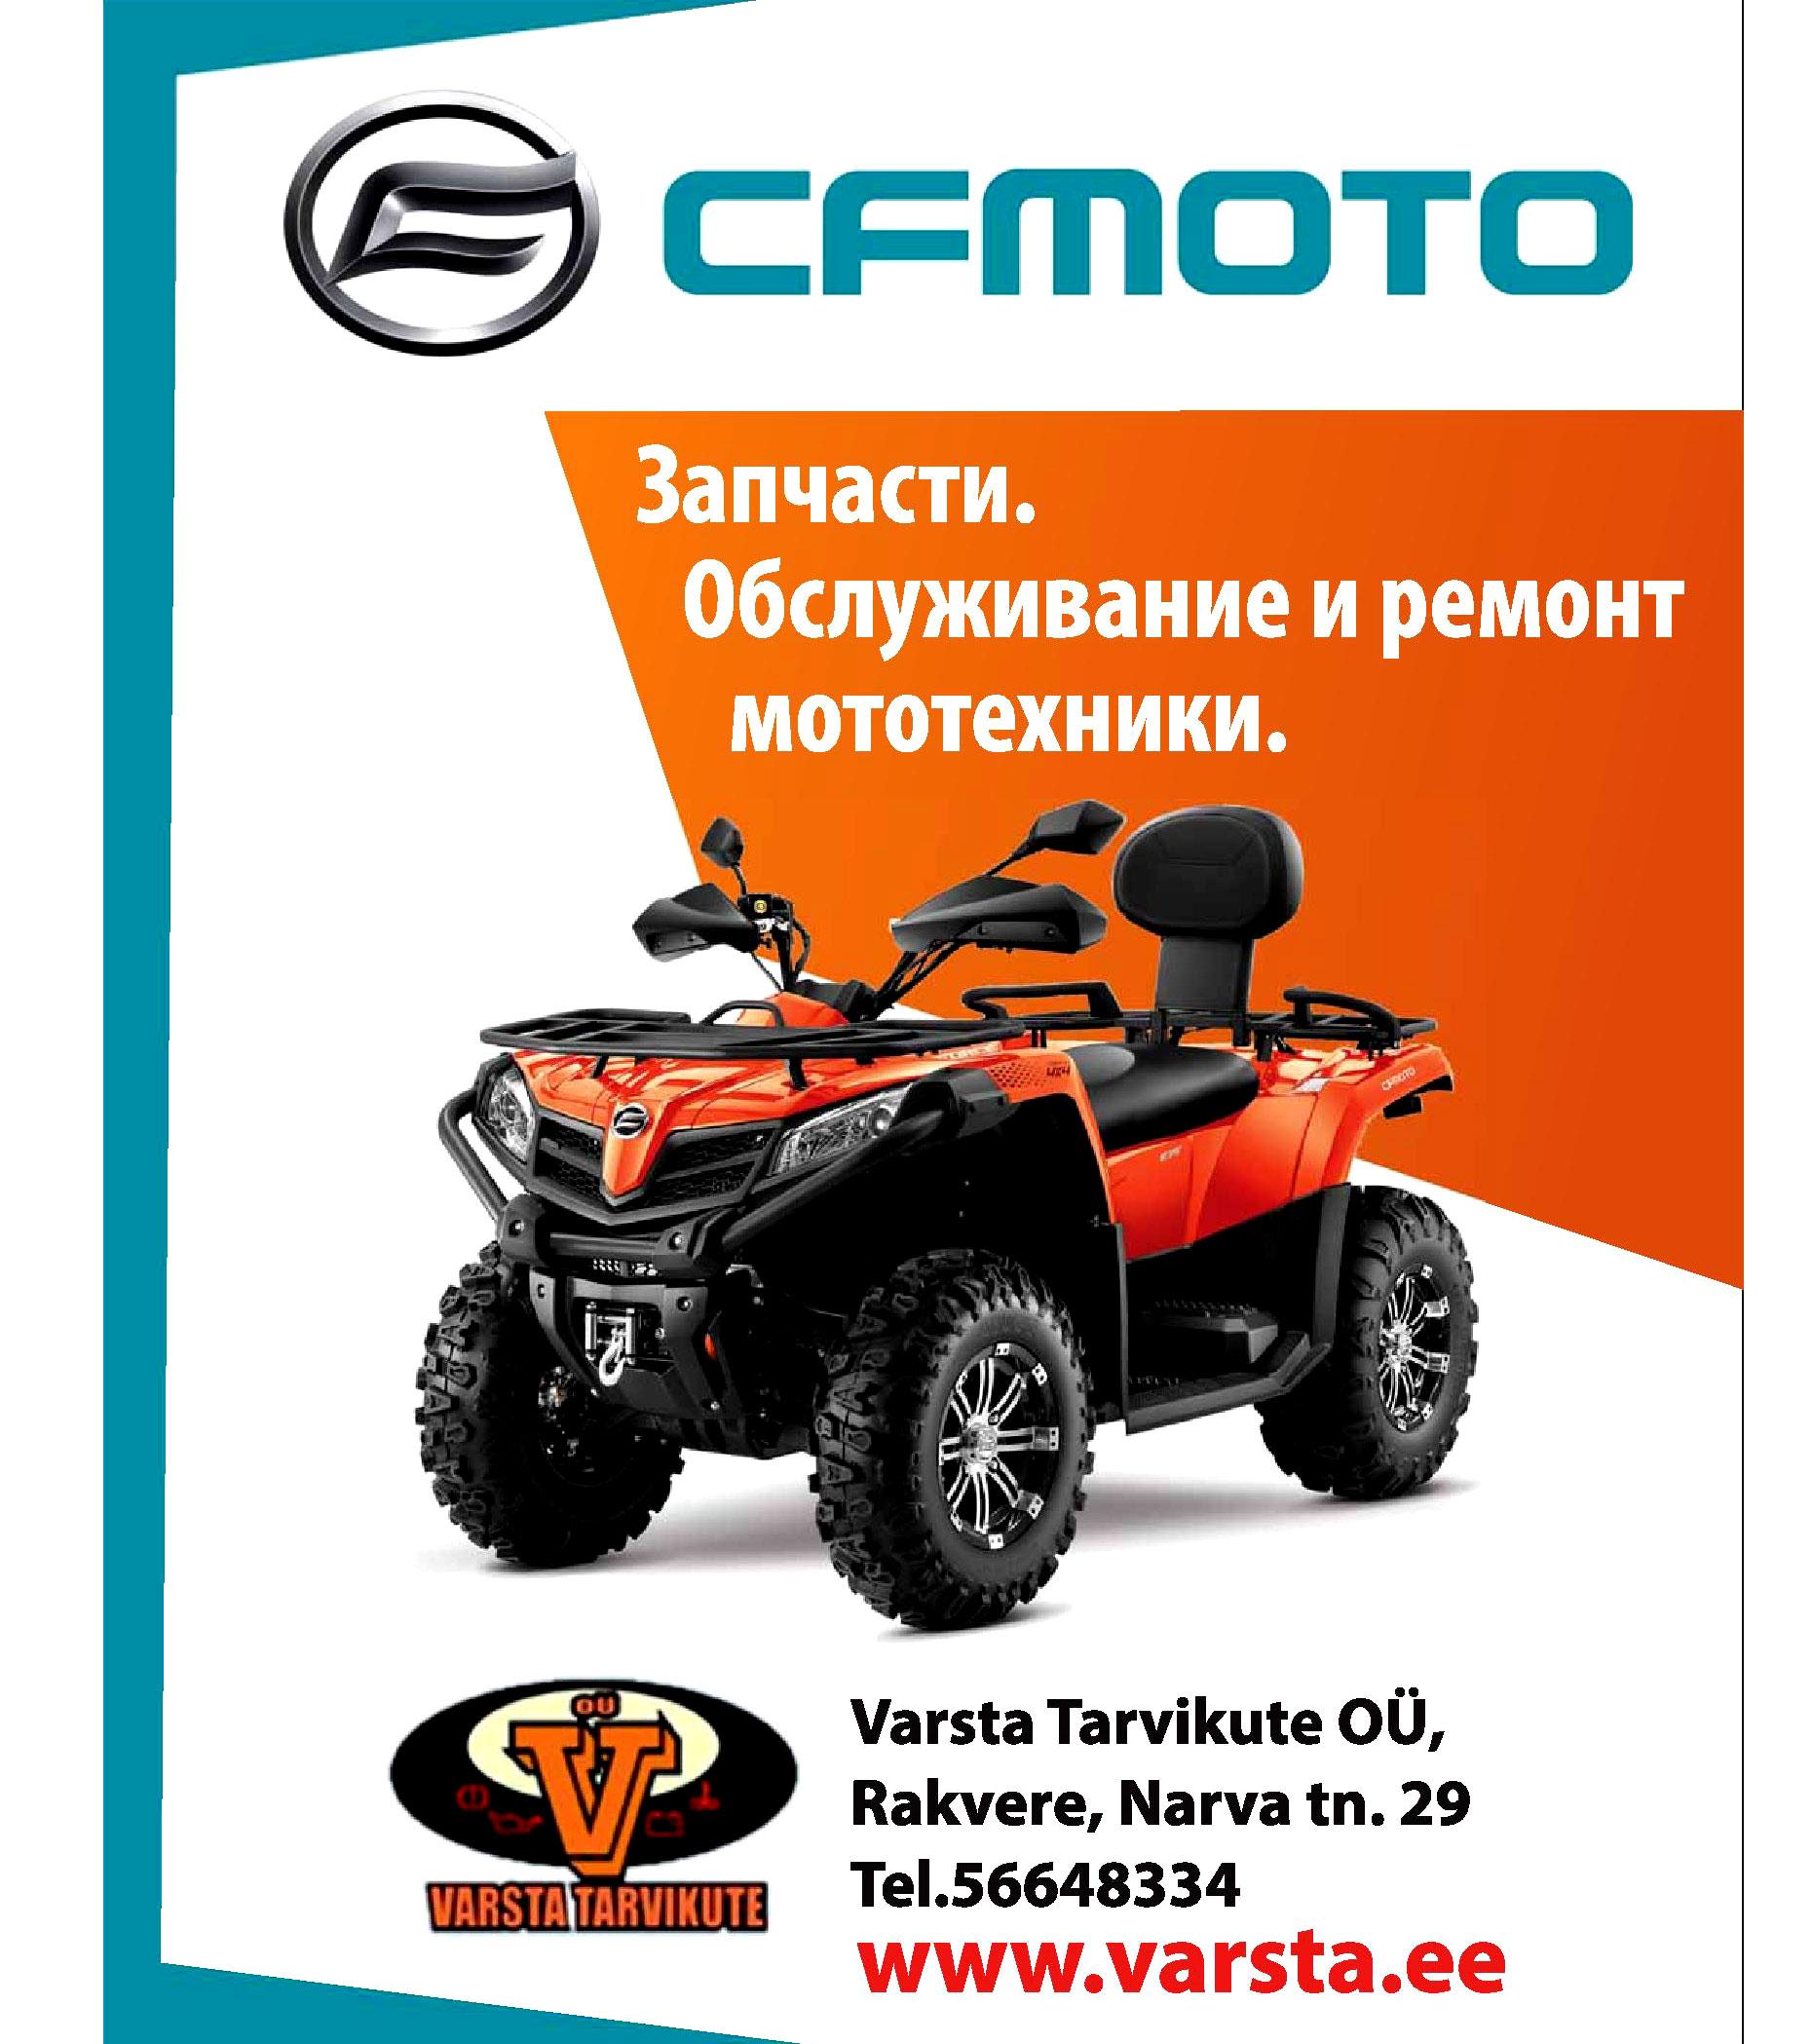 Varsta Tarvikute OÜ: Запчасти. Обслуживание и ремонт мототехники